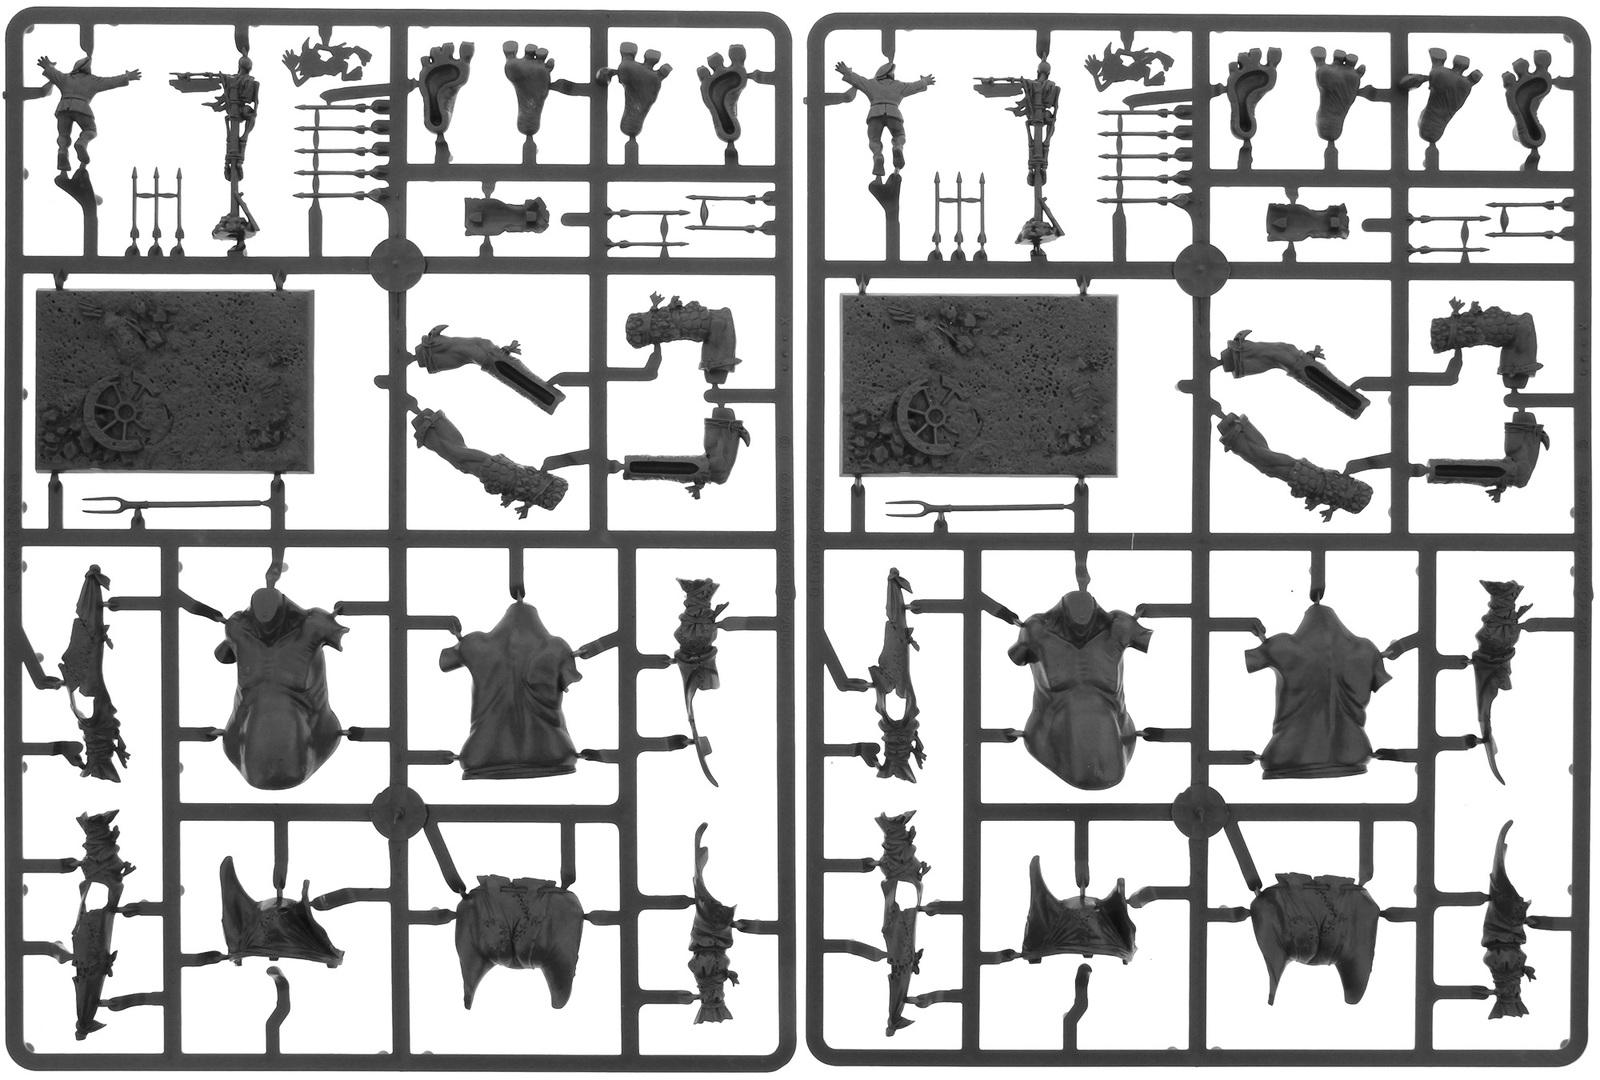 Warhammer Age of Sigmar: Aleguzzler Gargants Colossal Crushers image